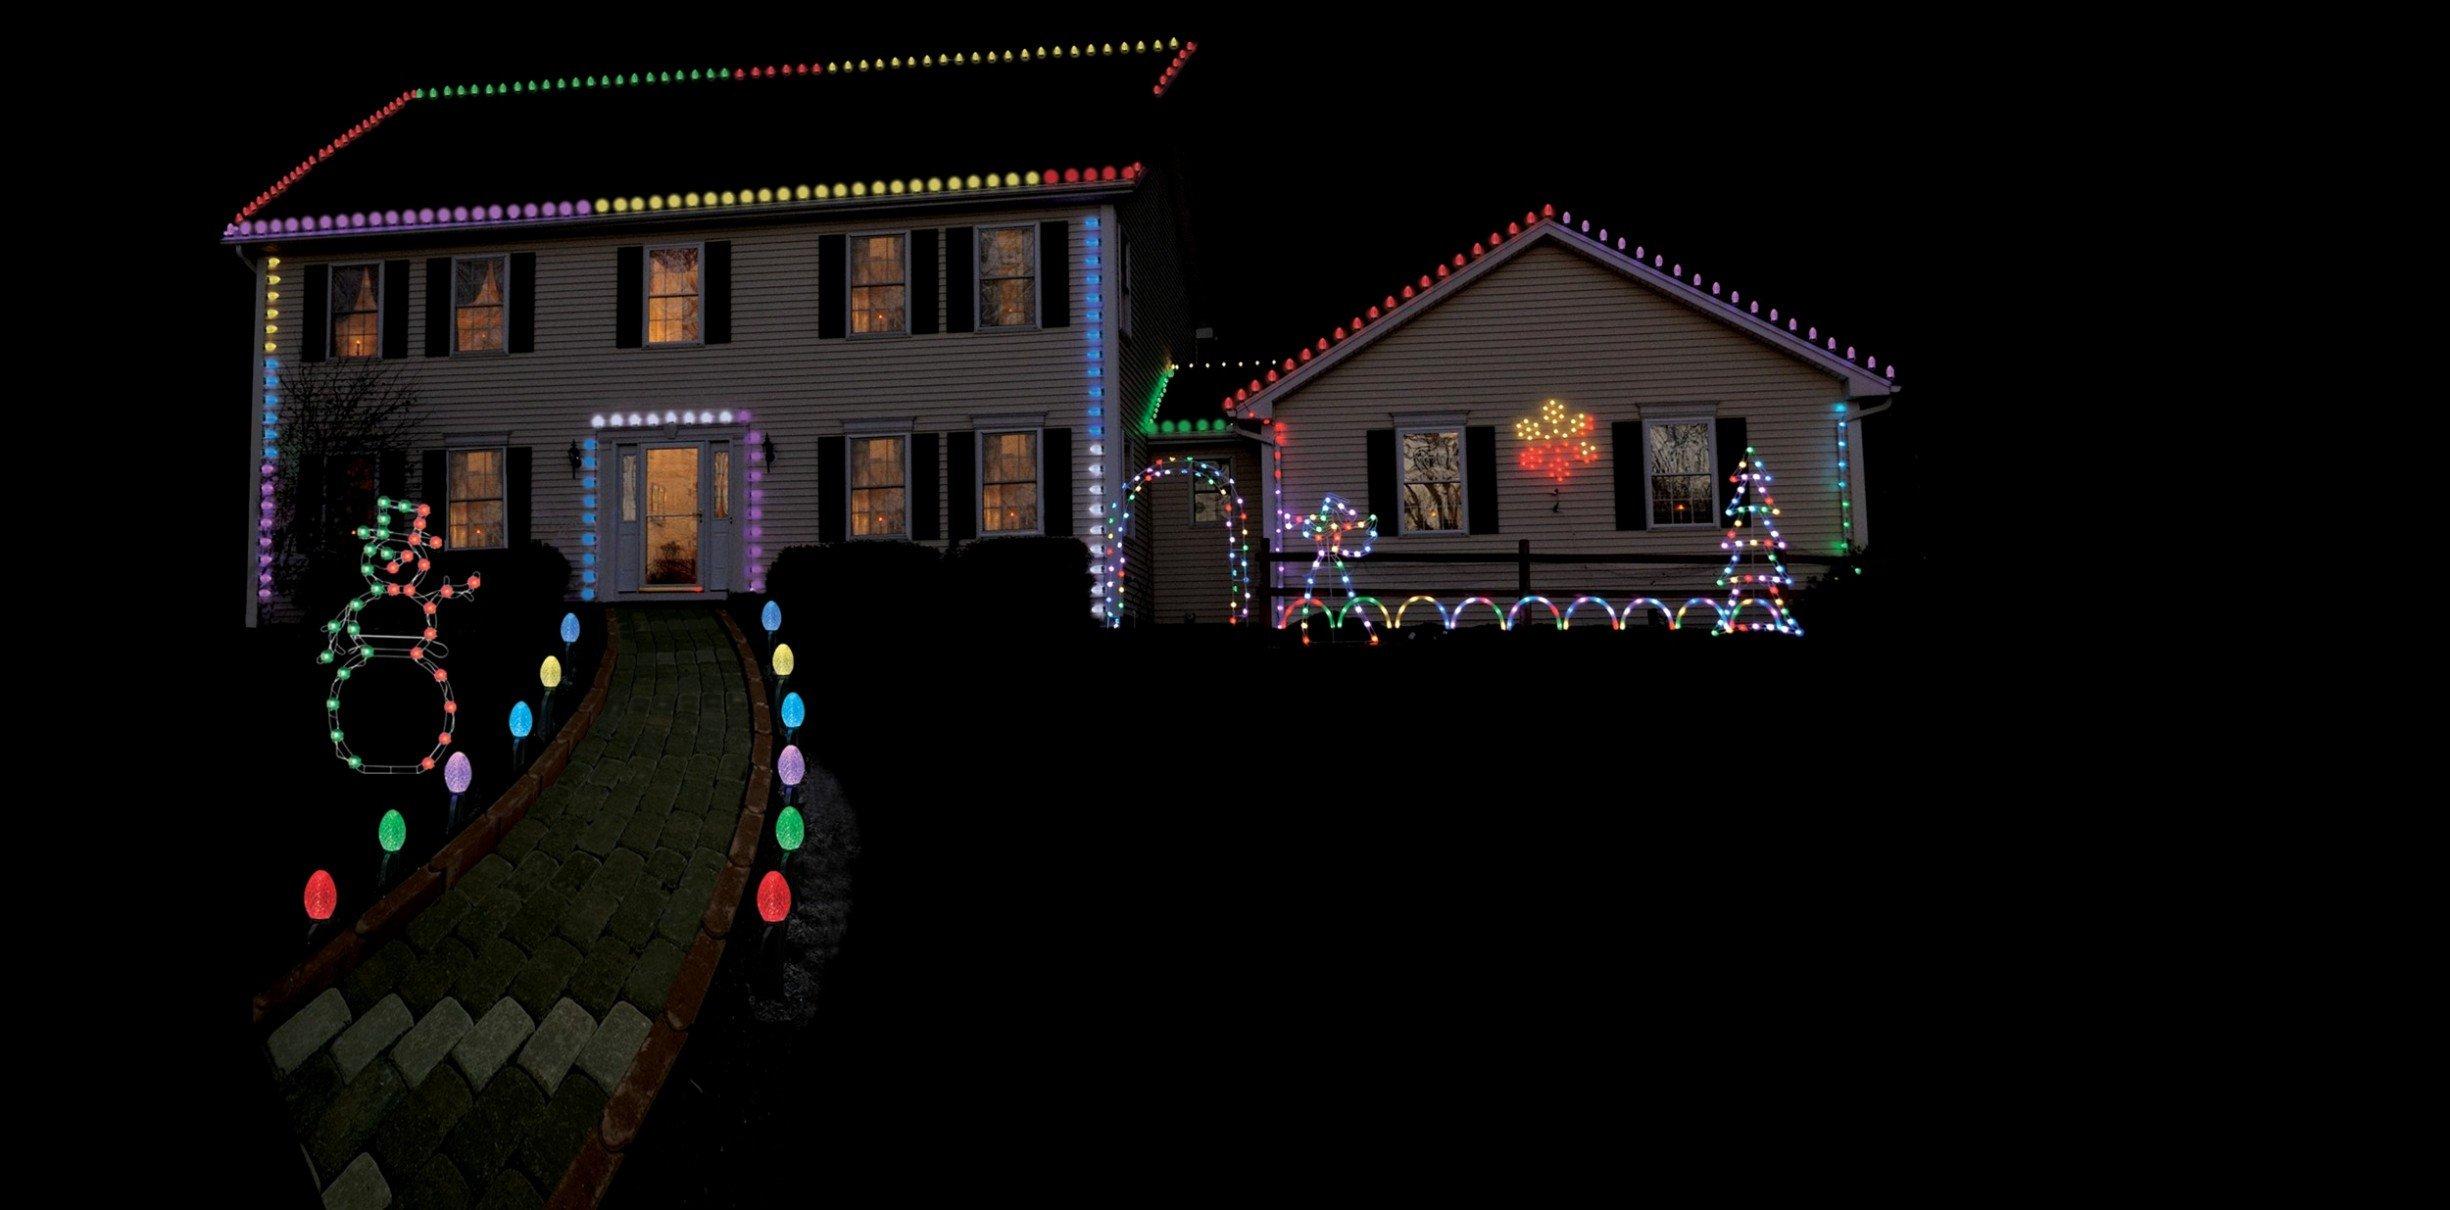 Twinkling Light for Bedroom Inspirational Christmas Lights Houses